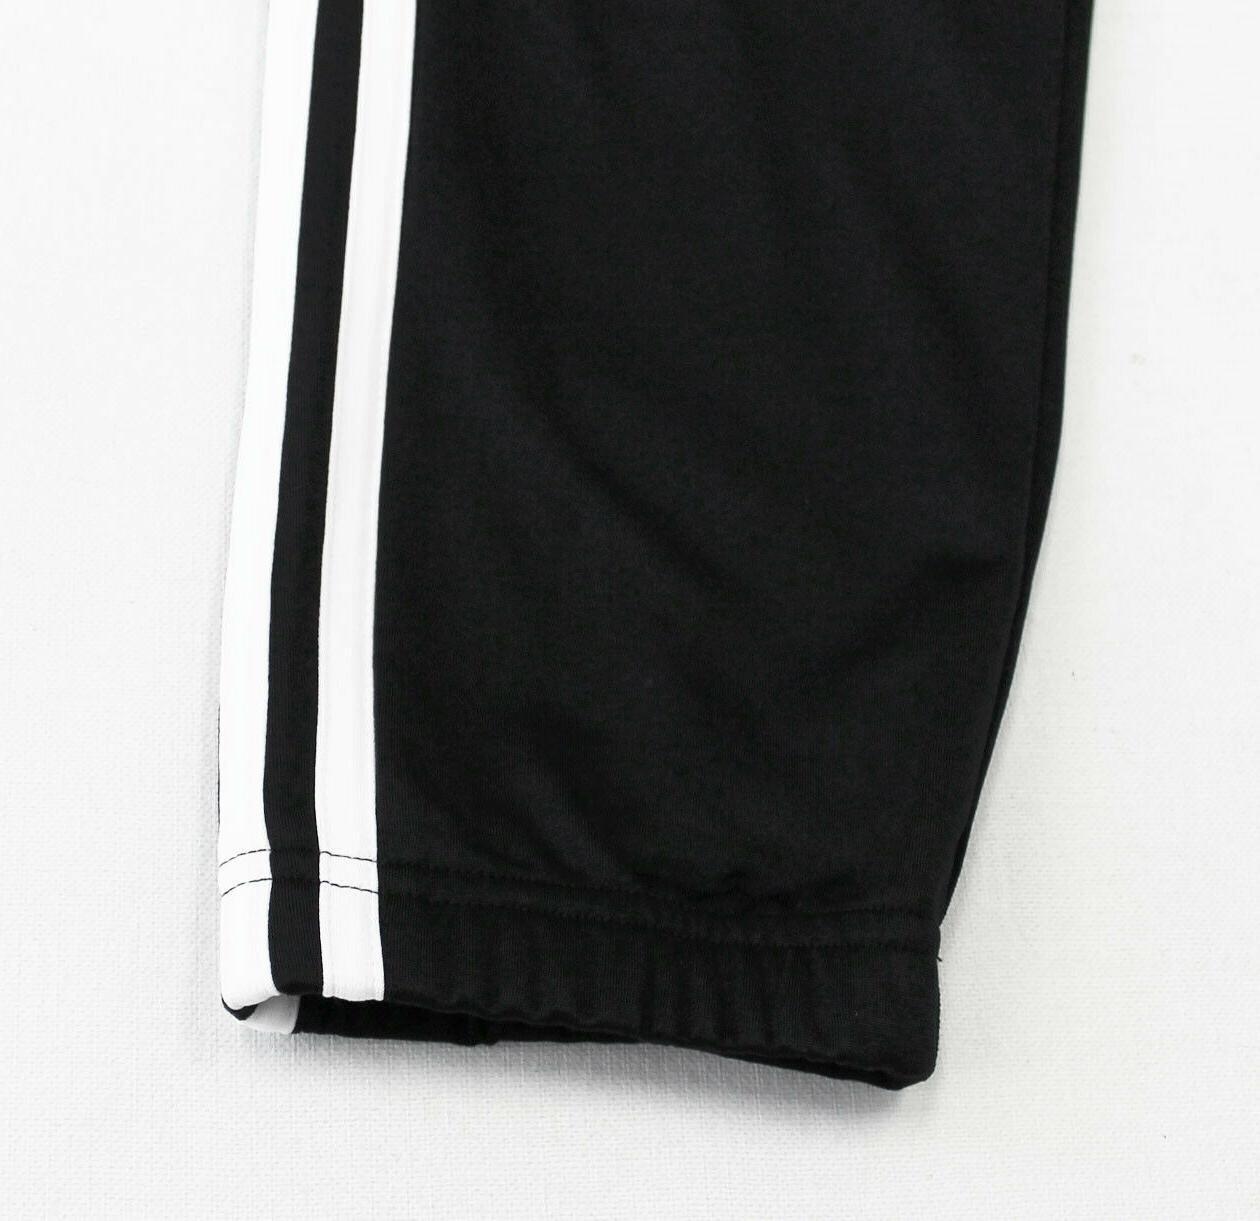 NWT Men's Black Cuffed Tricot Suit Set Jacket Pants Joggers